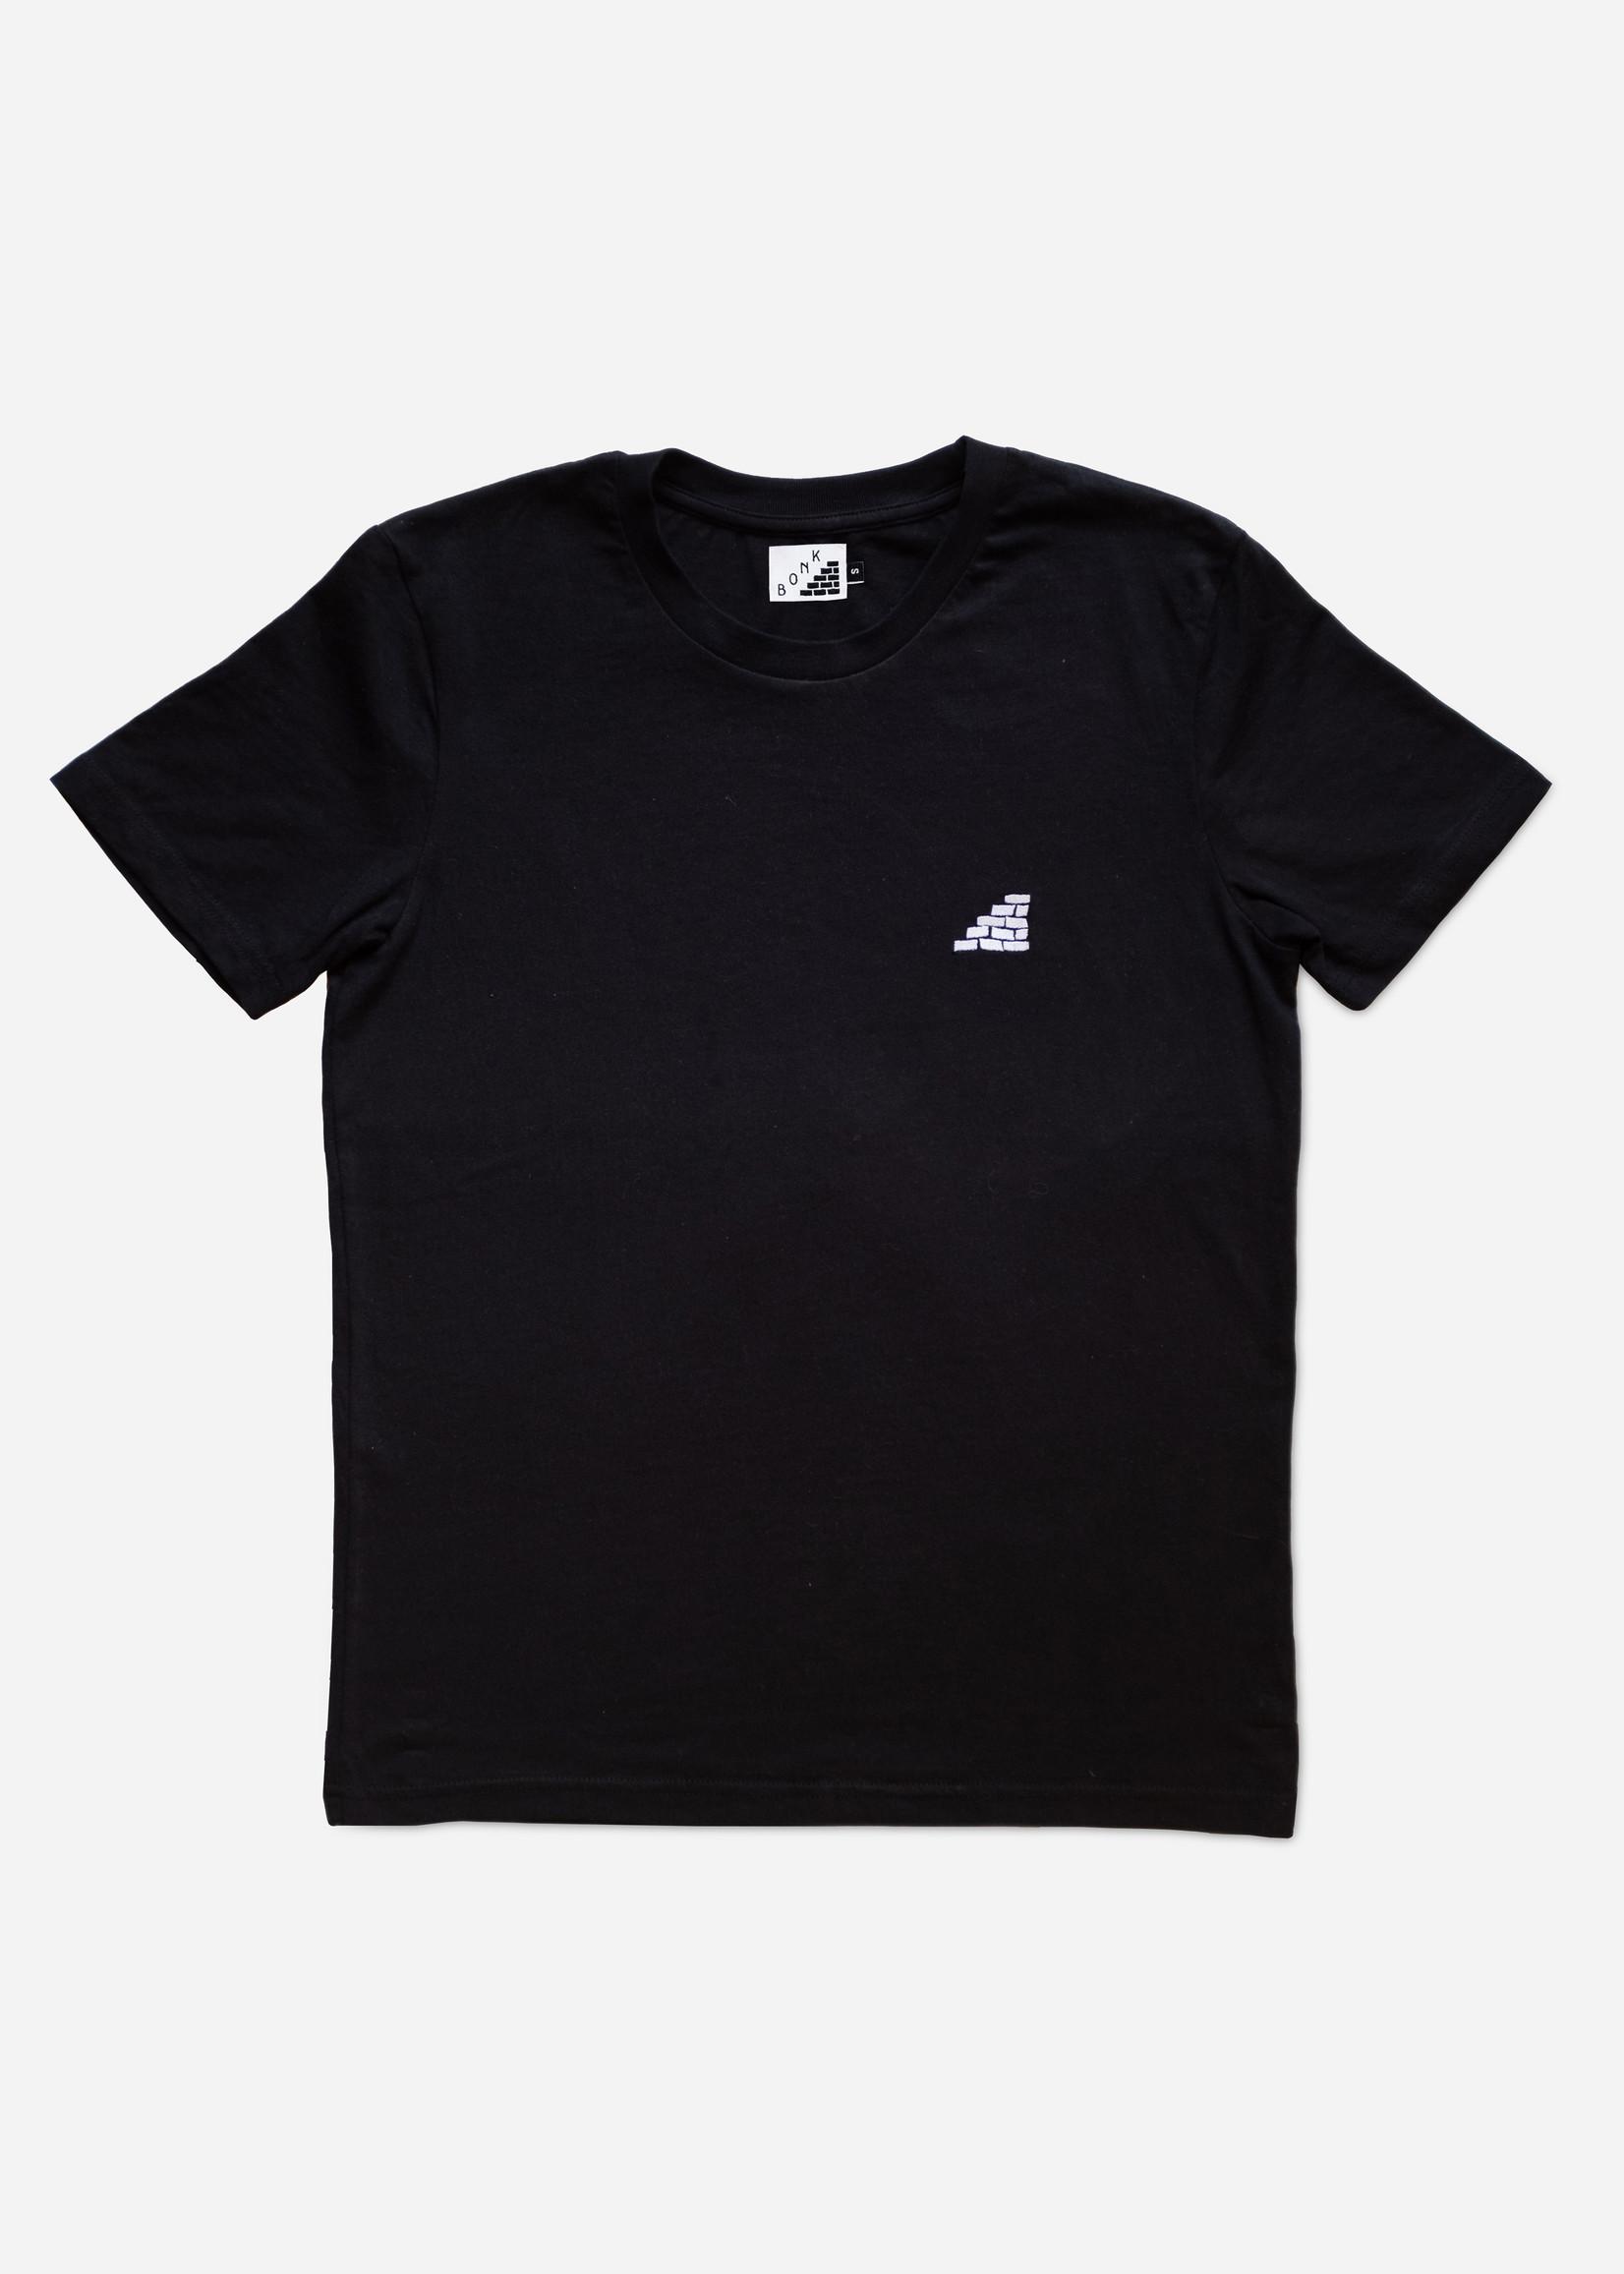 Bonk T-Shirt - Brick